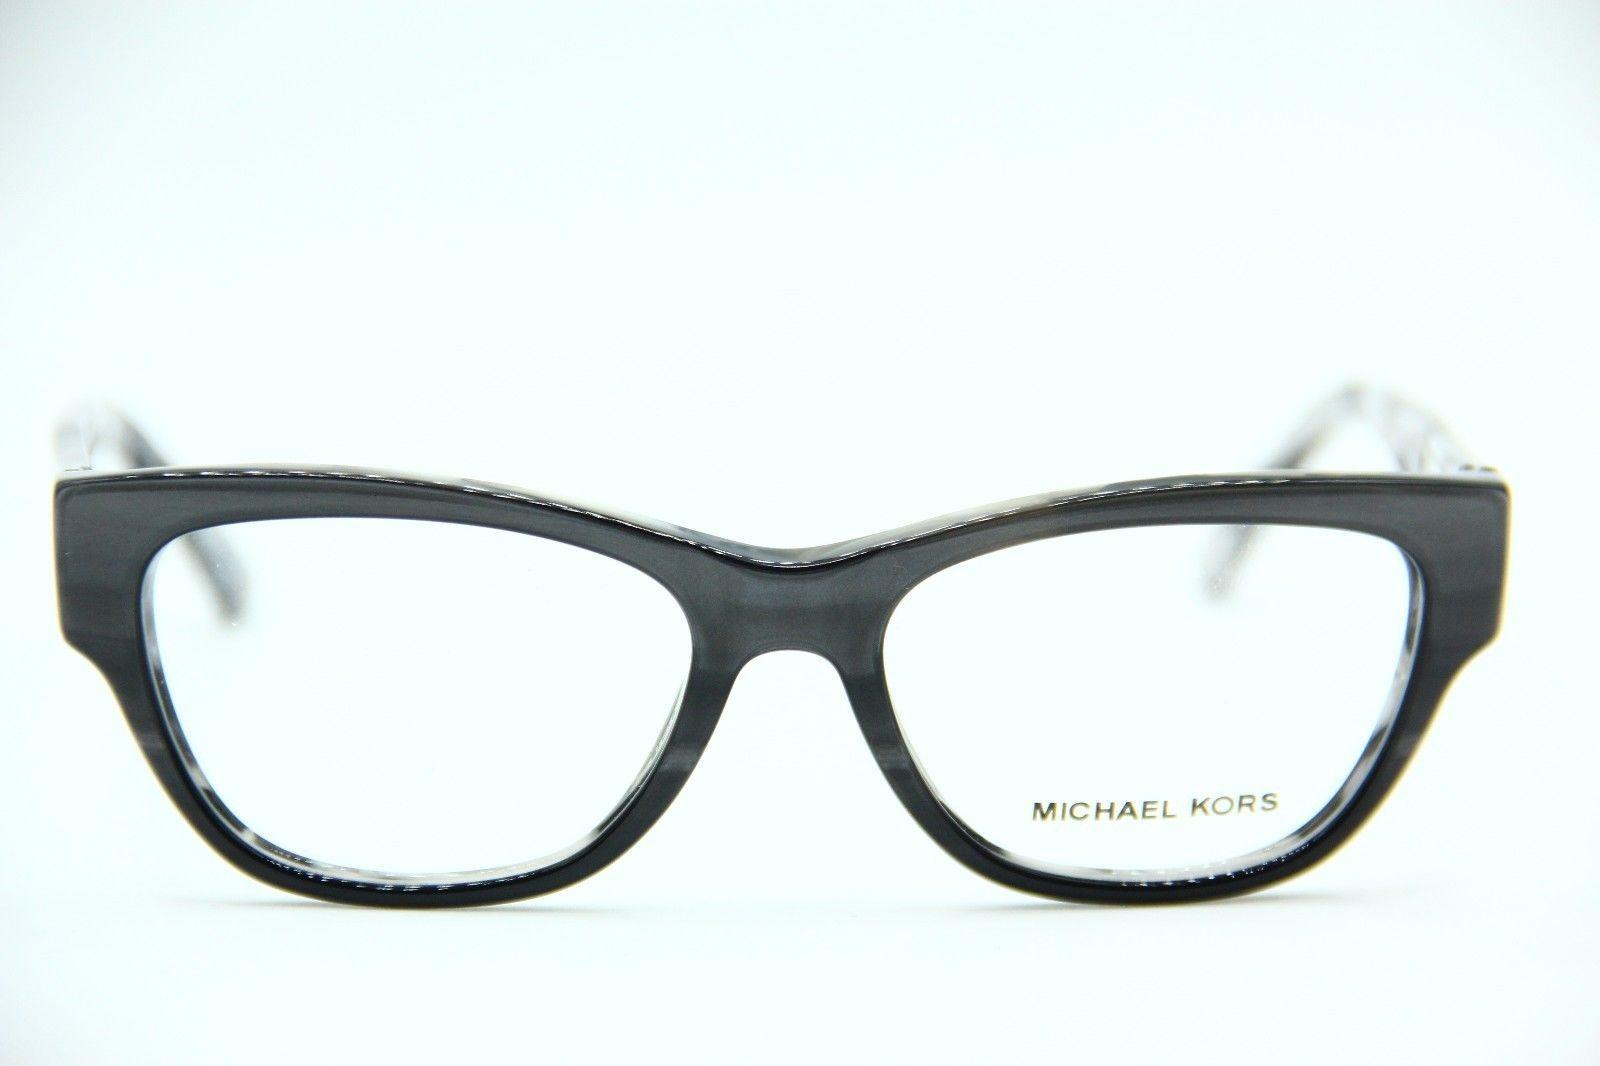 NEW MICHAEL KORS MK 4037 3211 GREY EYEGLASSES AUTHENTIC RX MK4037 51-16 image 2